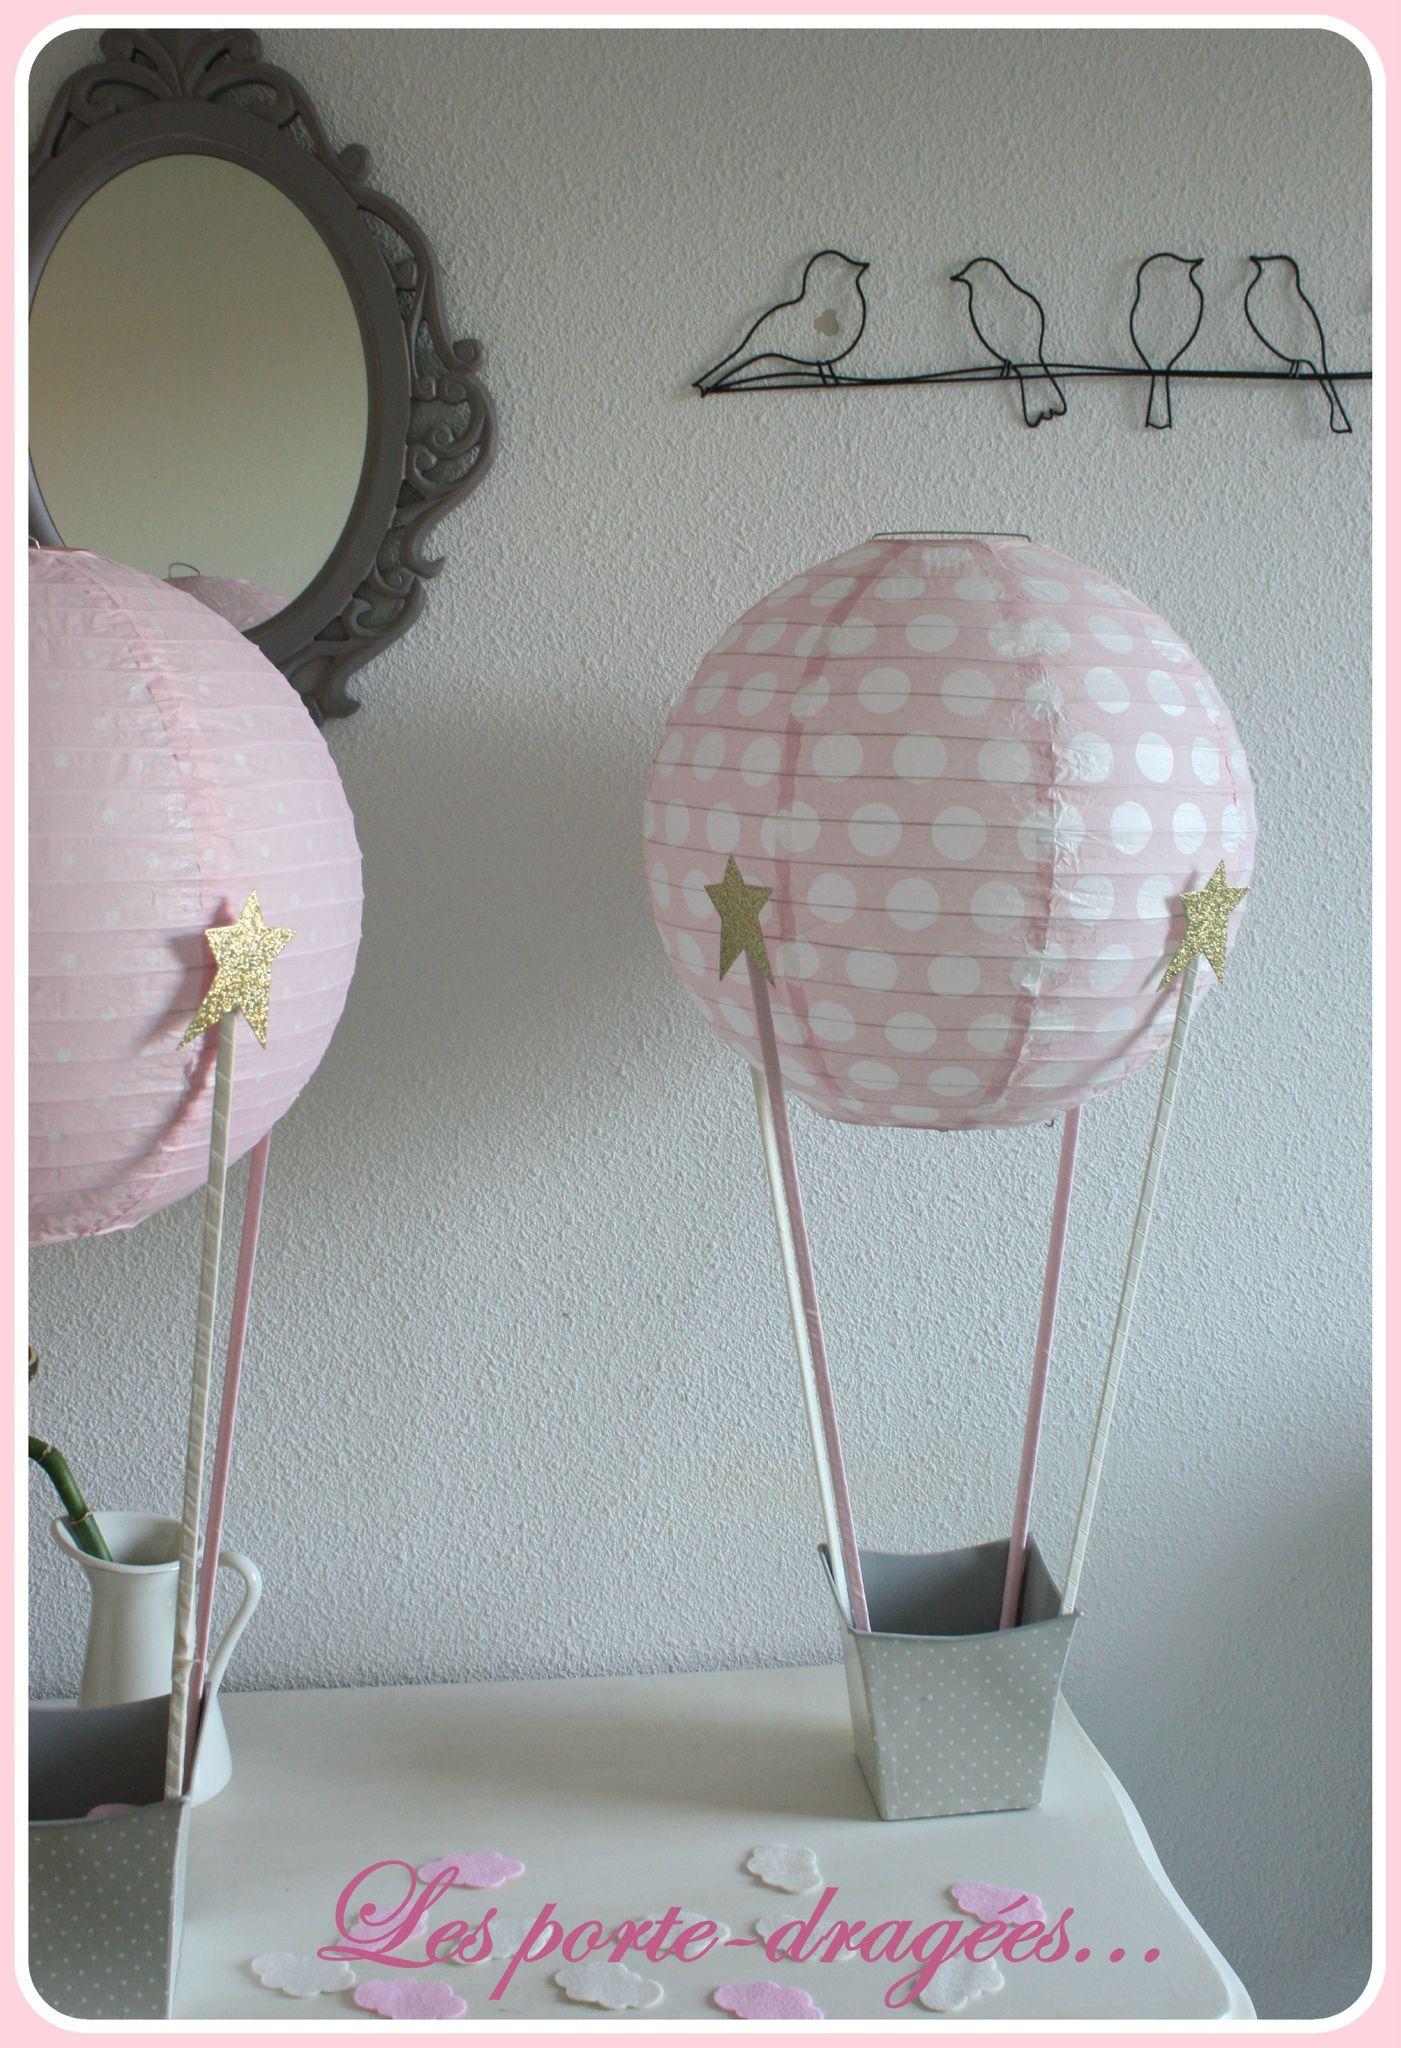 deco bapteme fille rose montgolfiere dore dragees doudou d co pinterest bird. Black Bedroom Furniture Sets. Home Design Ideas